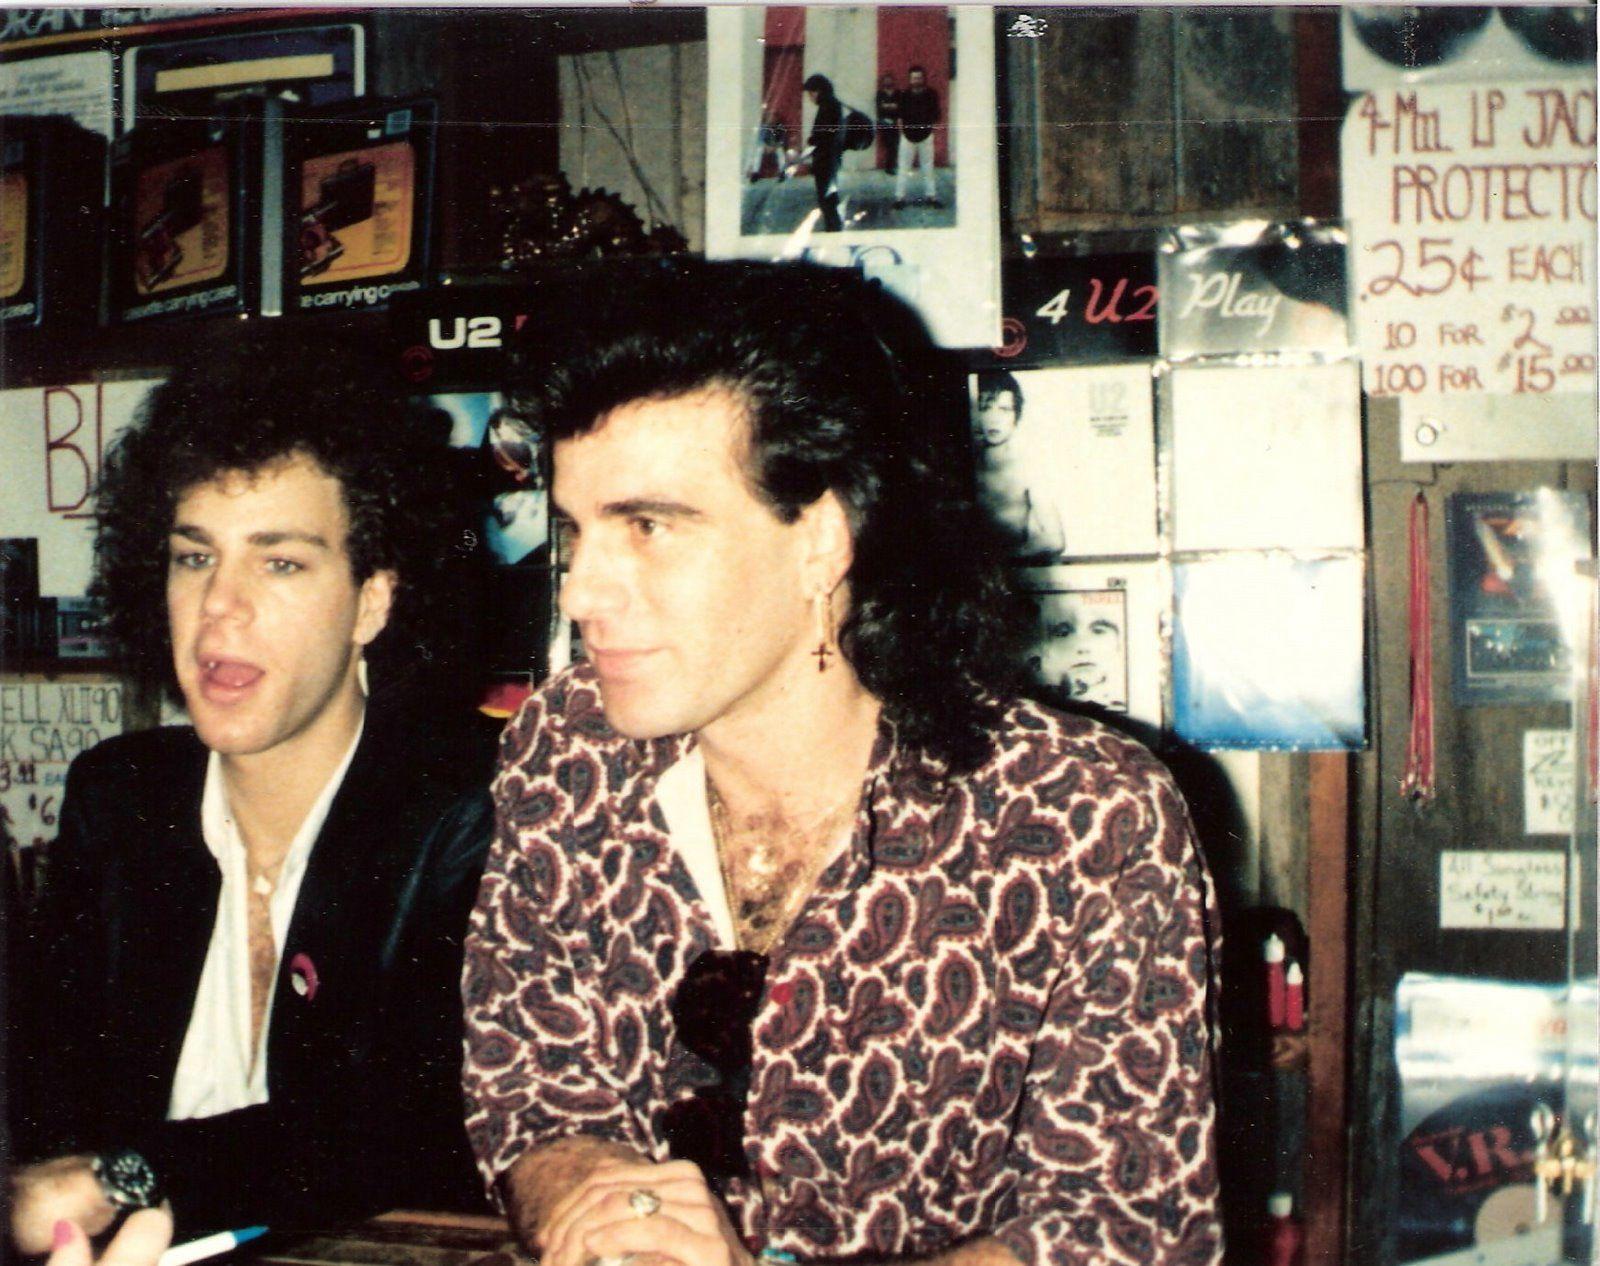 Tico Torres and David Bryan, Bon Jovi (1985)